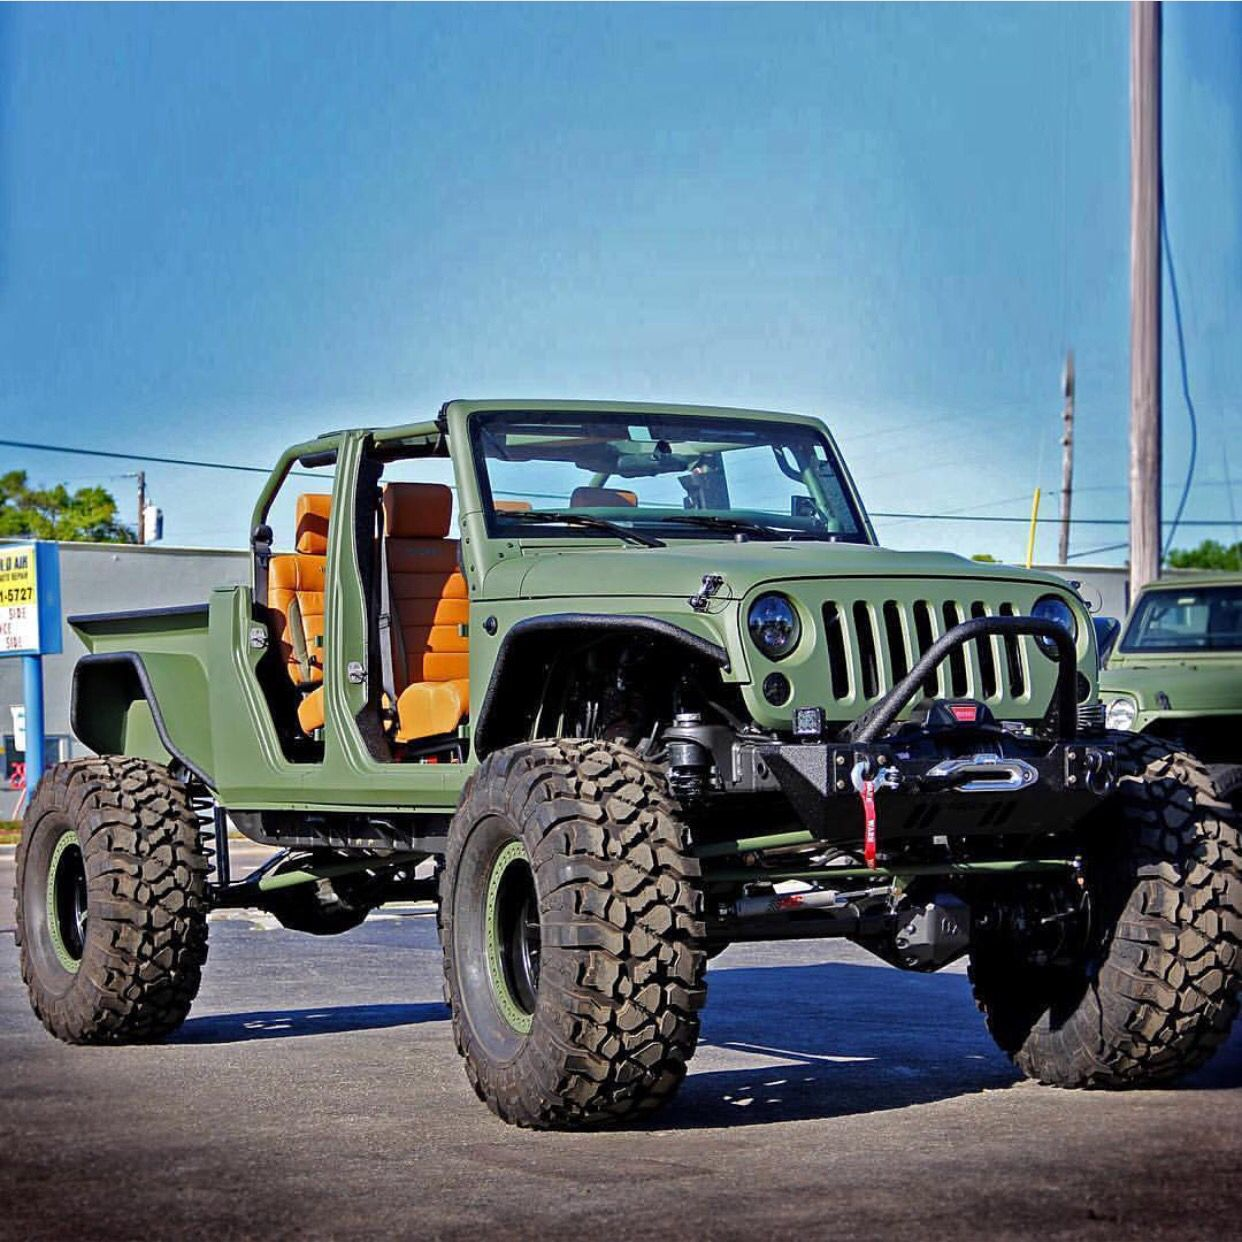 Jacked Up Jeep Wrangler >> Army Jeep Wrangler Pickup Push Bar Beige Leather Seats Jacked Up